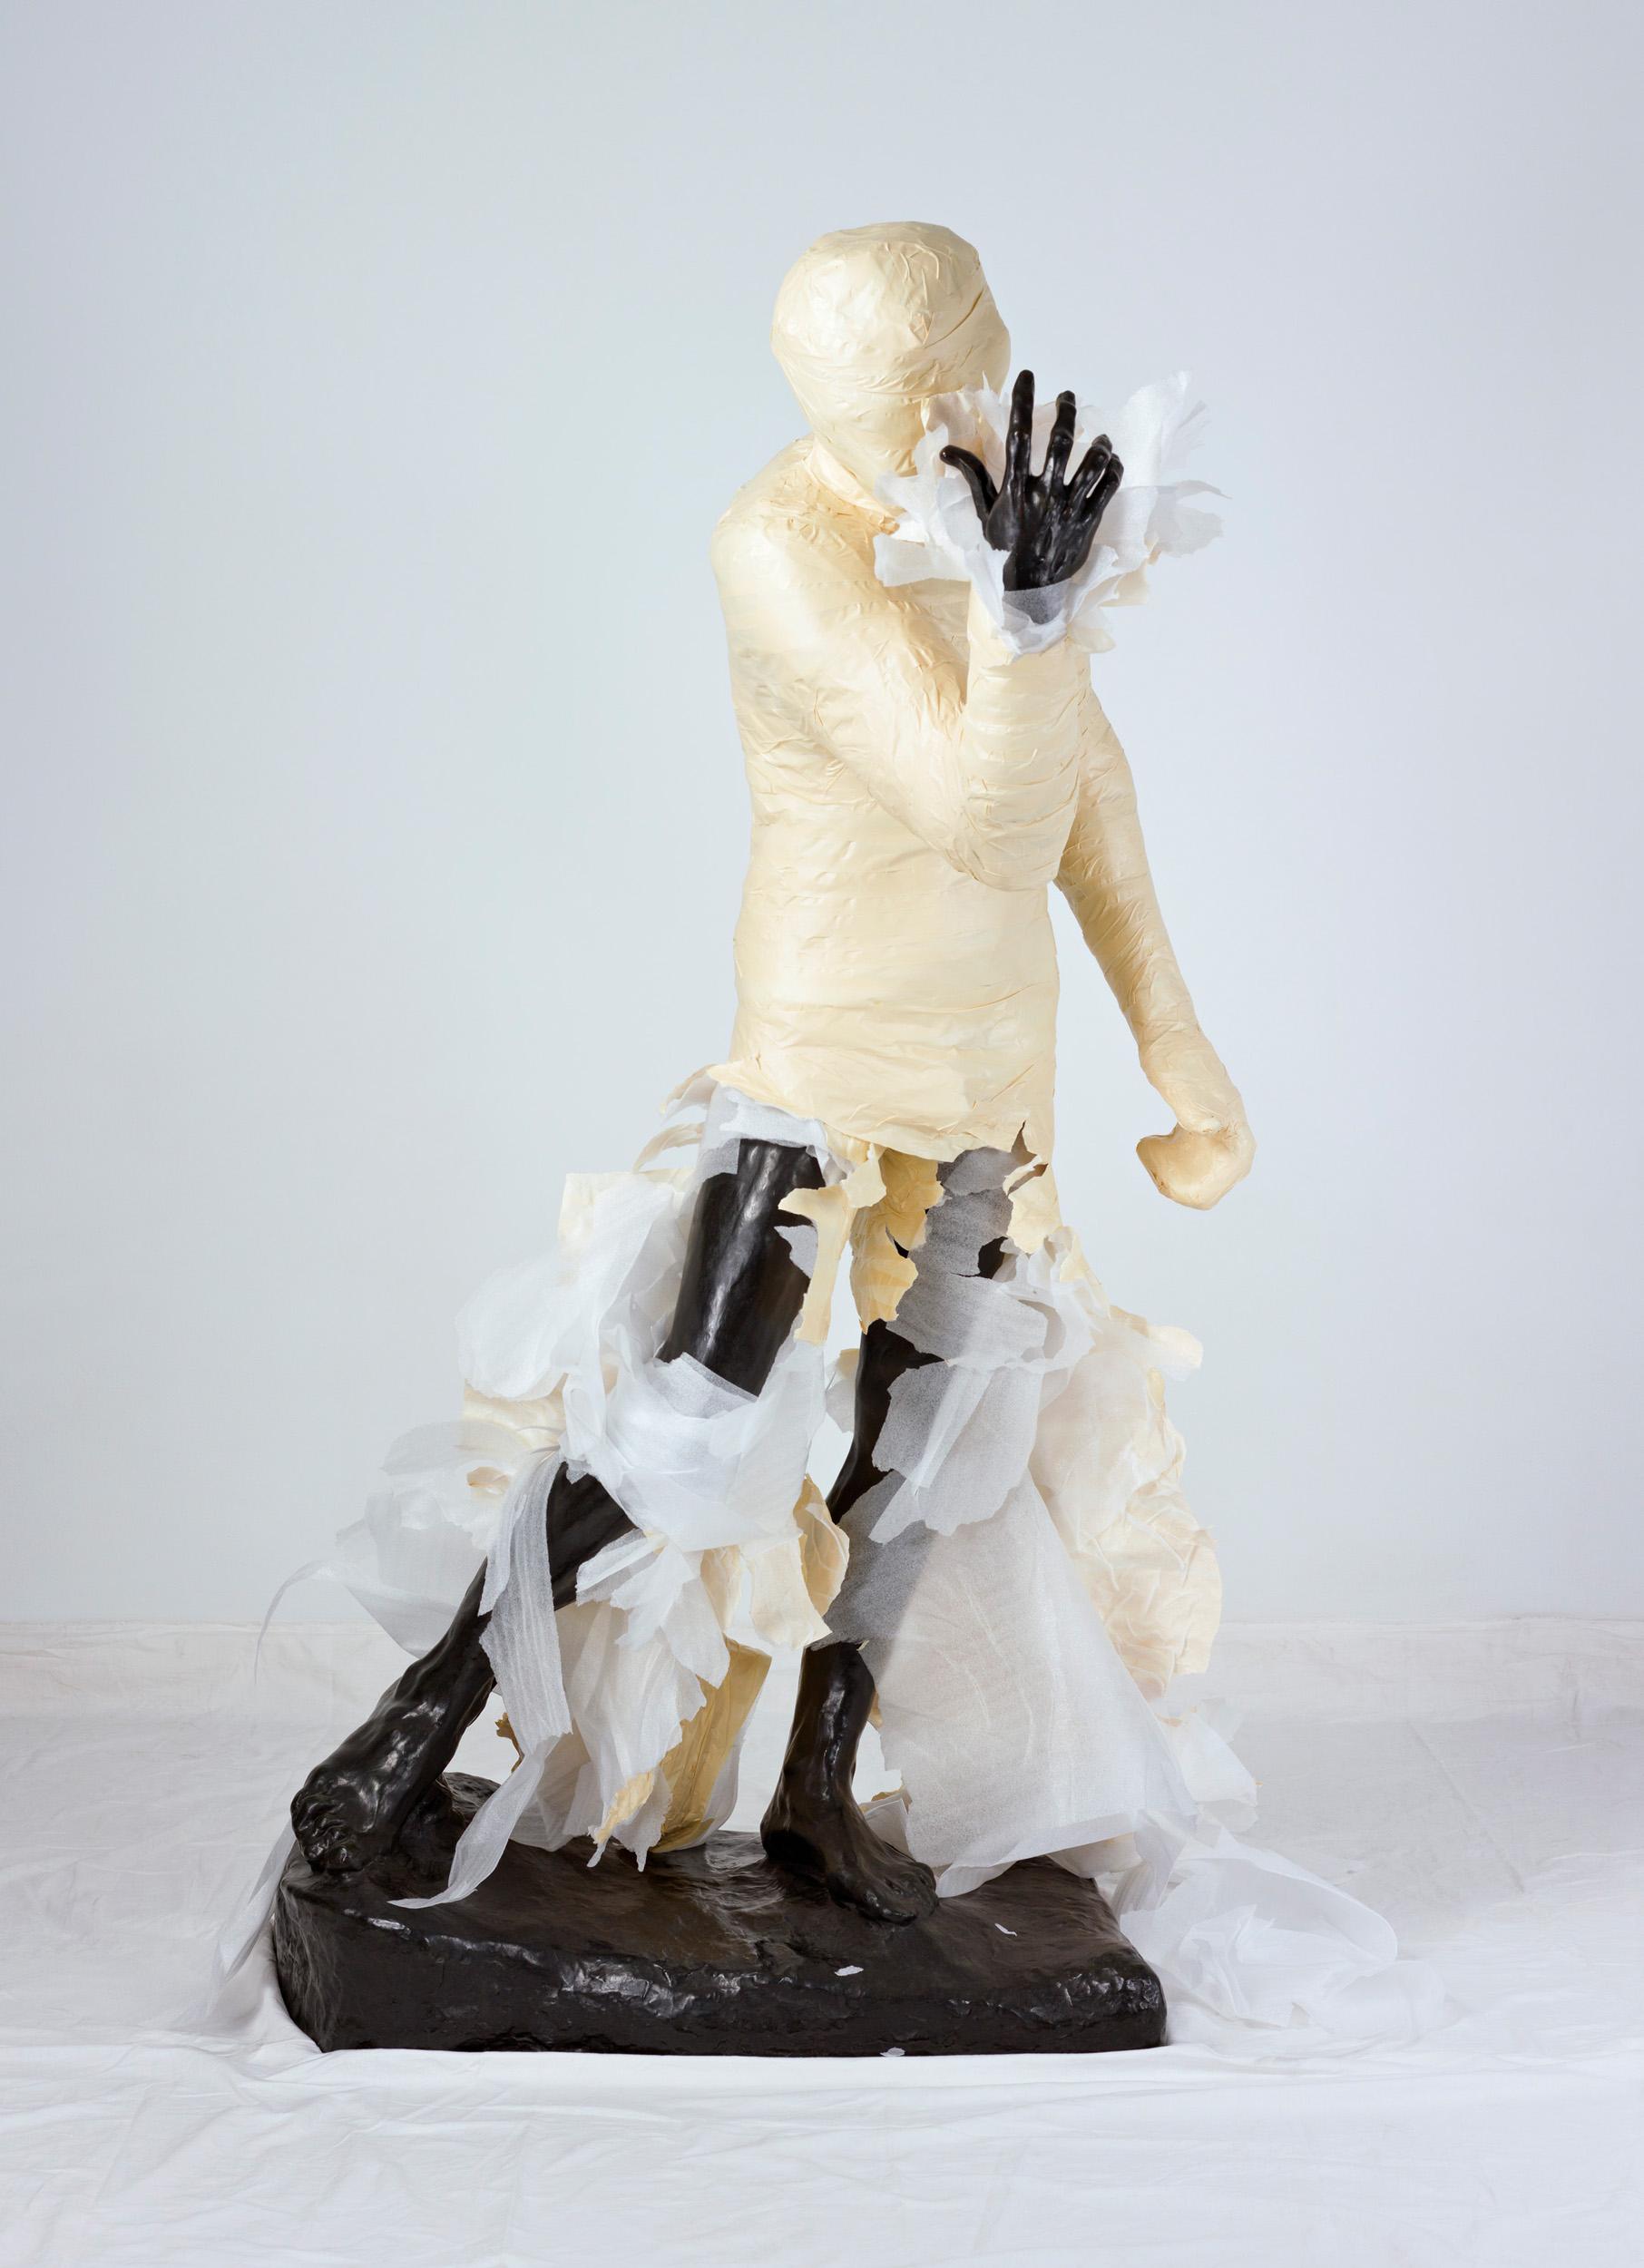 2010_Unwrapping_Rodin_White_4.jpg